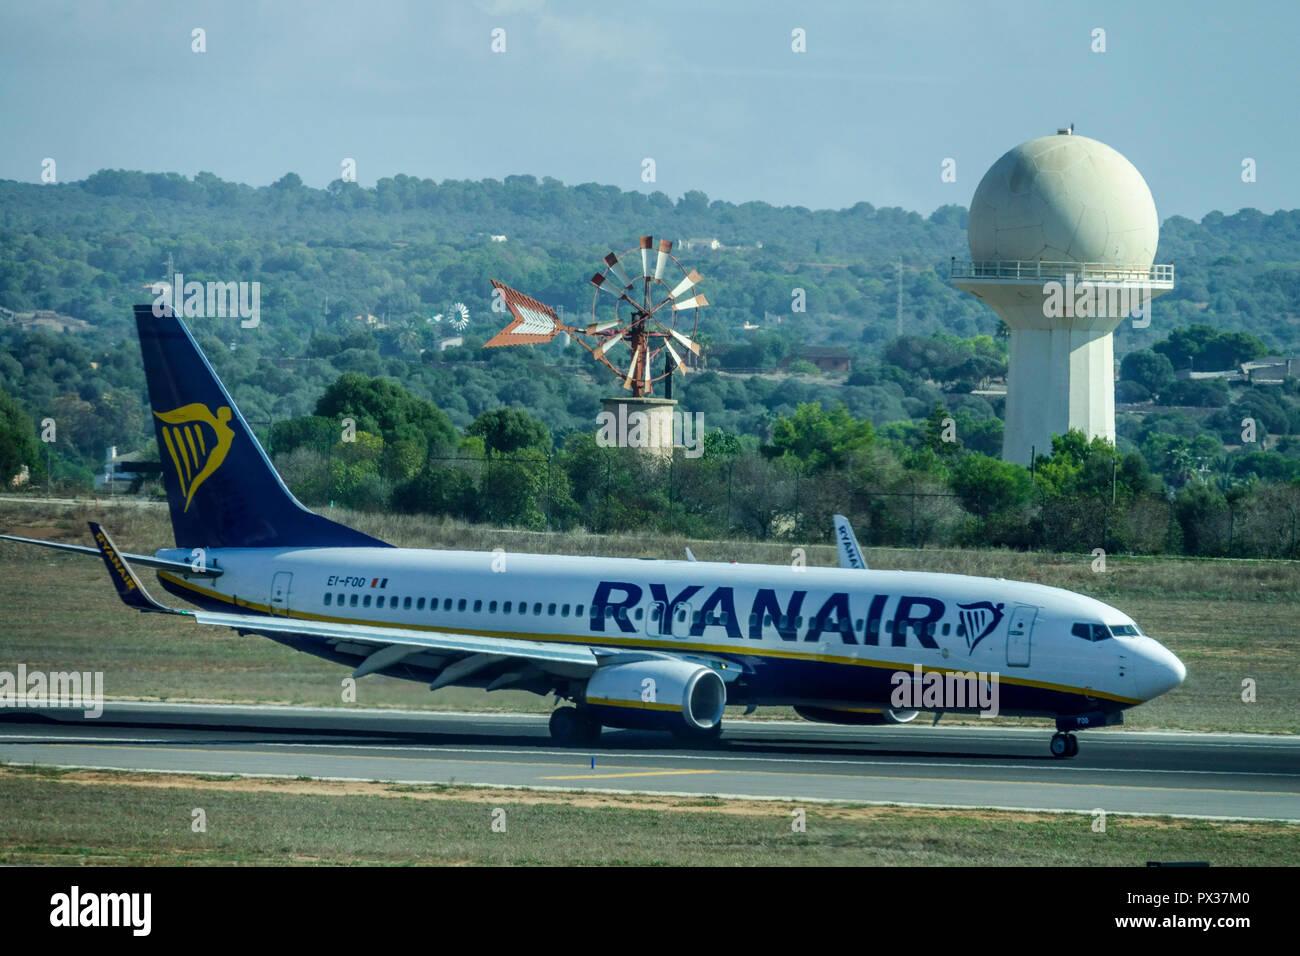 Ryanair plane on runway, Palma de Mallorca airport, Spain - Stock Image